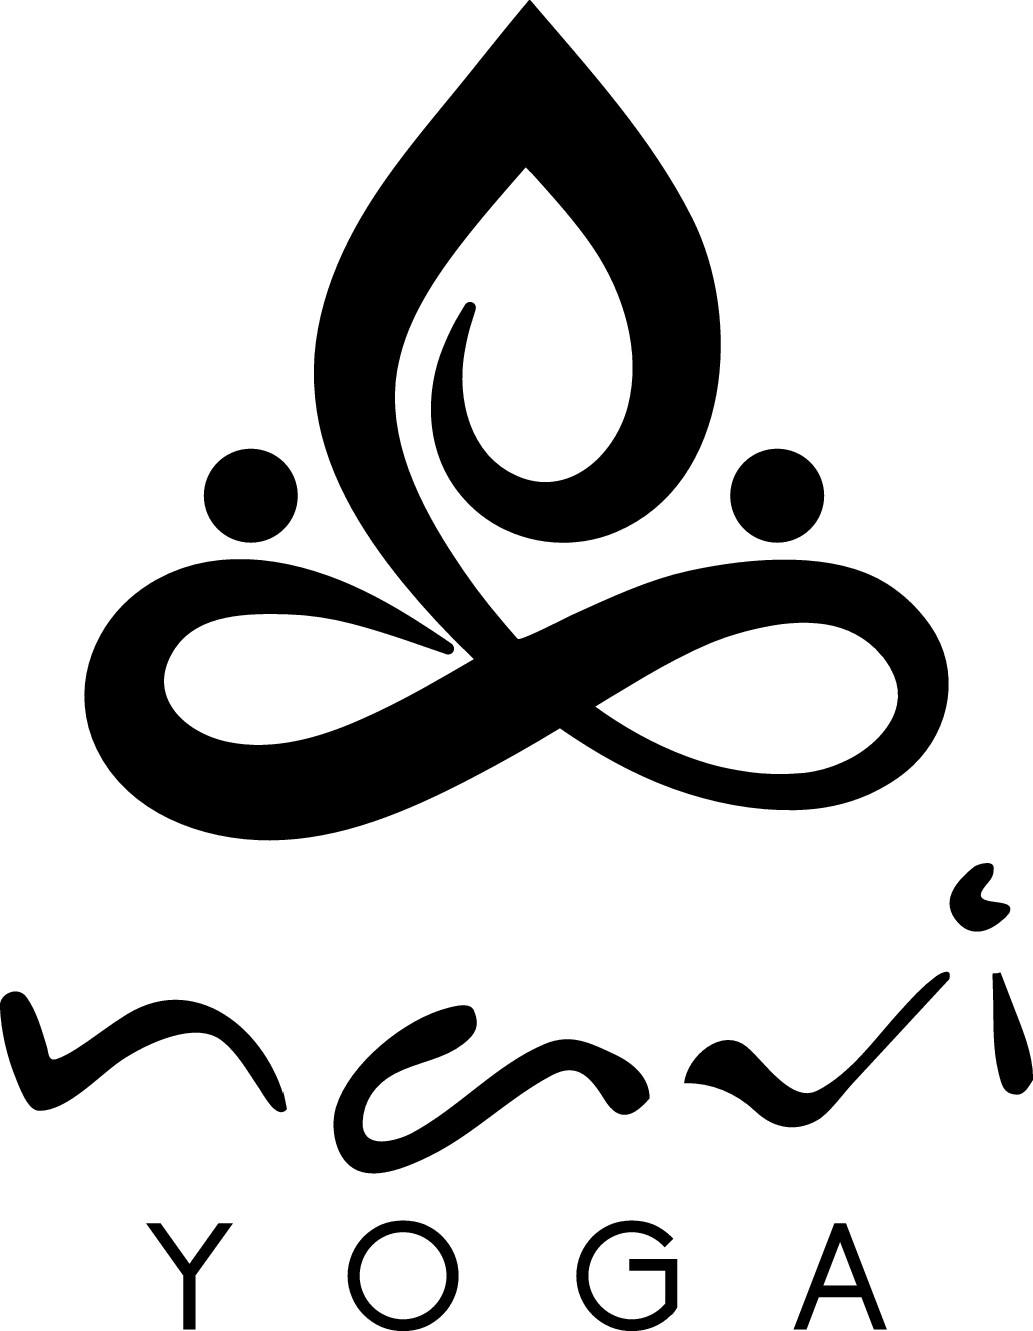 Yoga teacher seeks a calm contemporary logo with flair